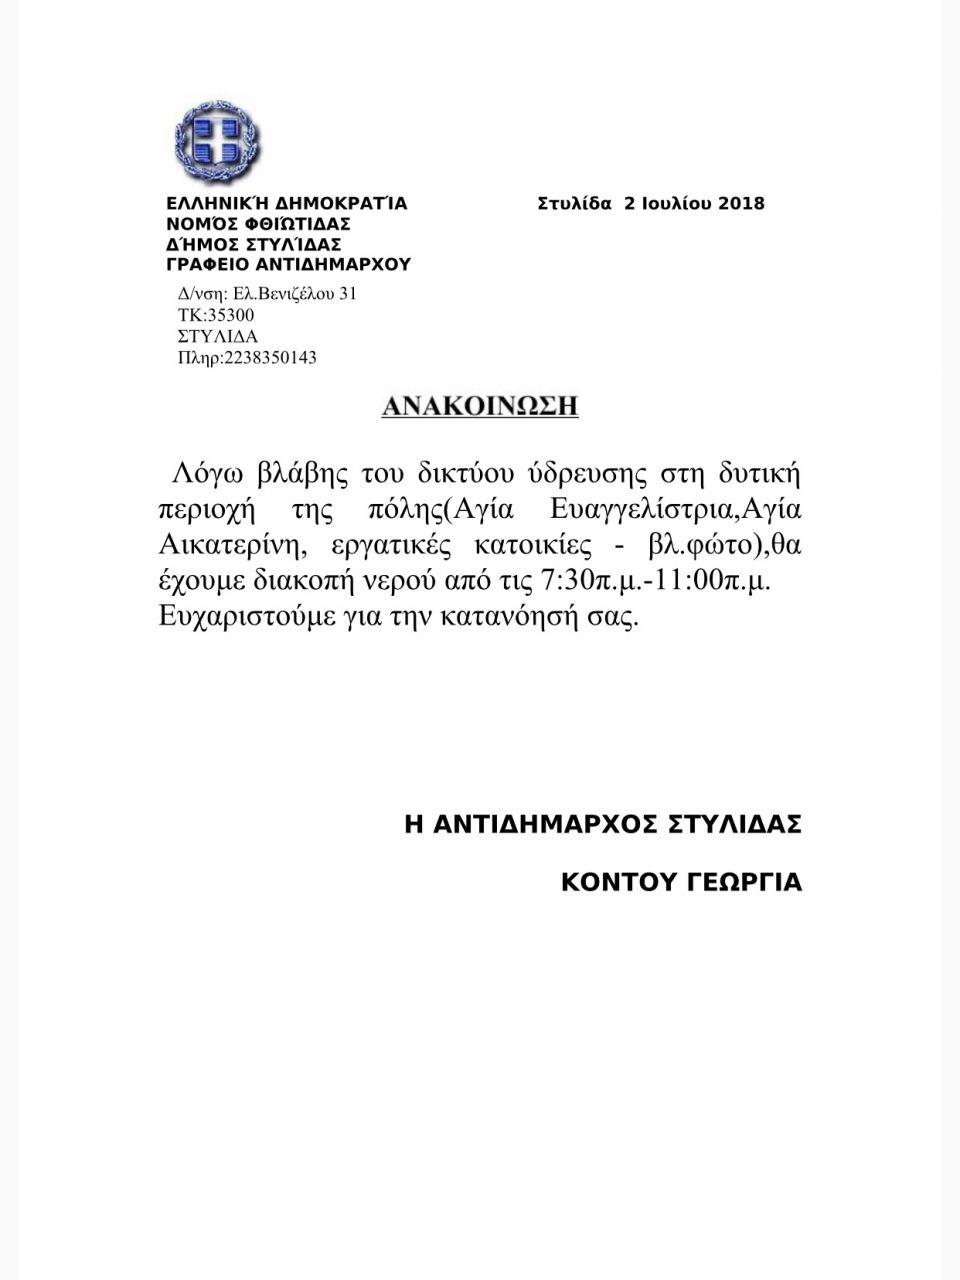 img 7238 ΣΤΥΛΙΔΑ ΔΙΑΚΟΠΗ ΝΕΡΟΥ